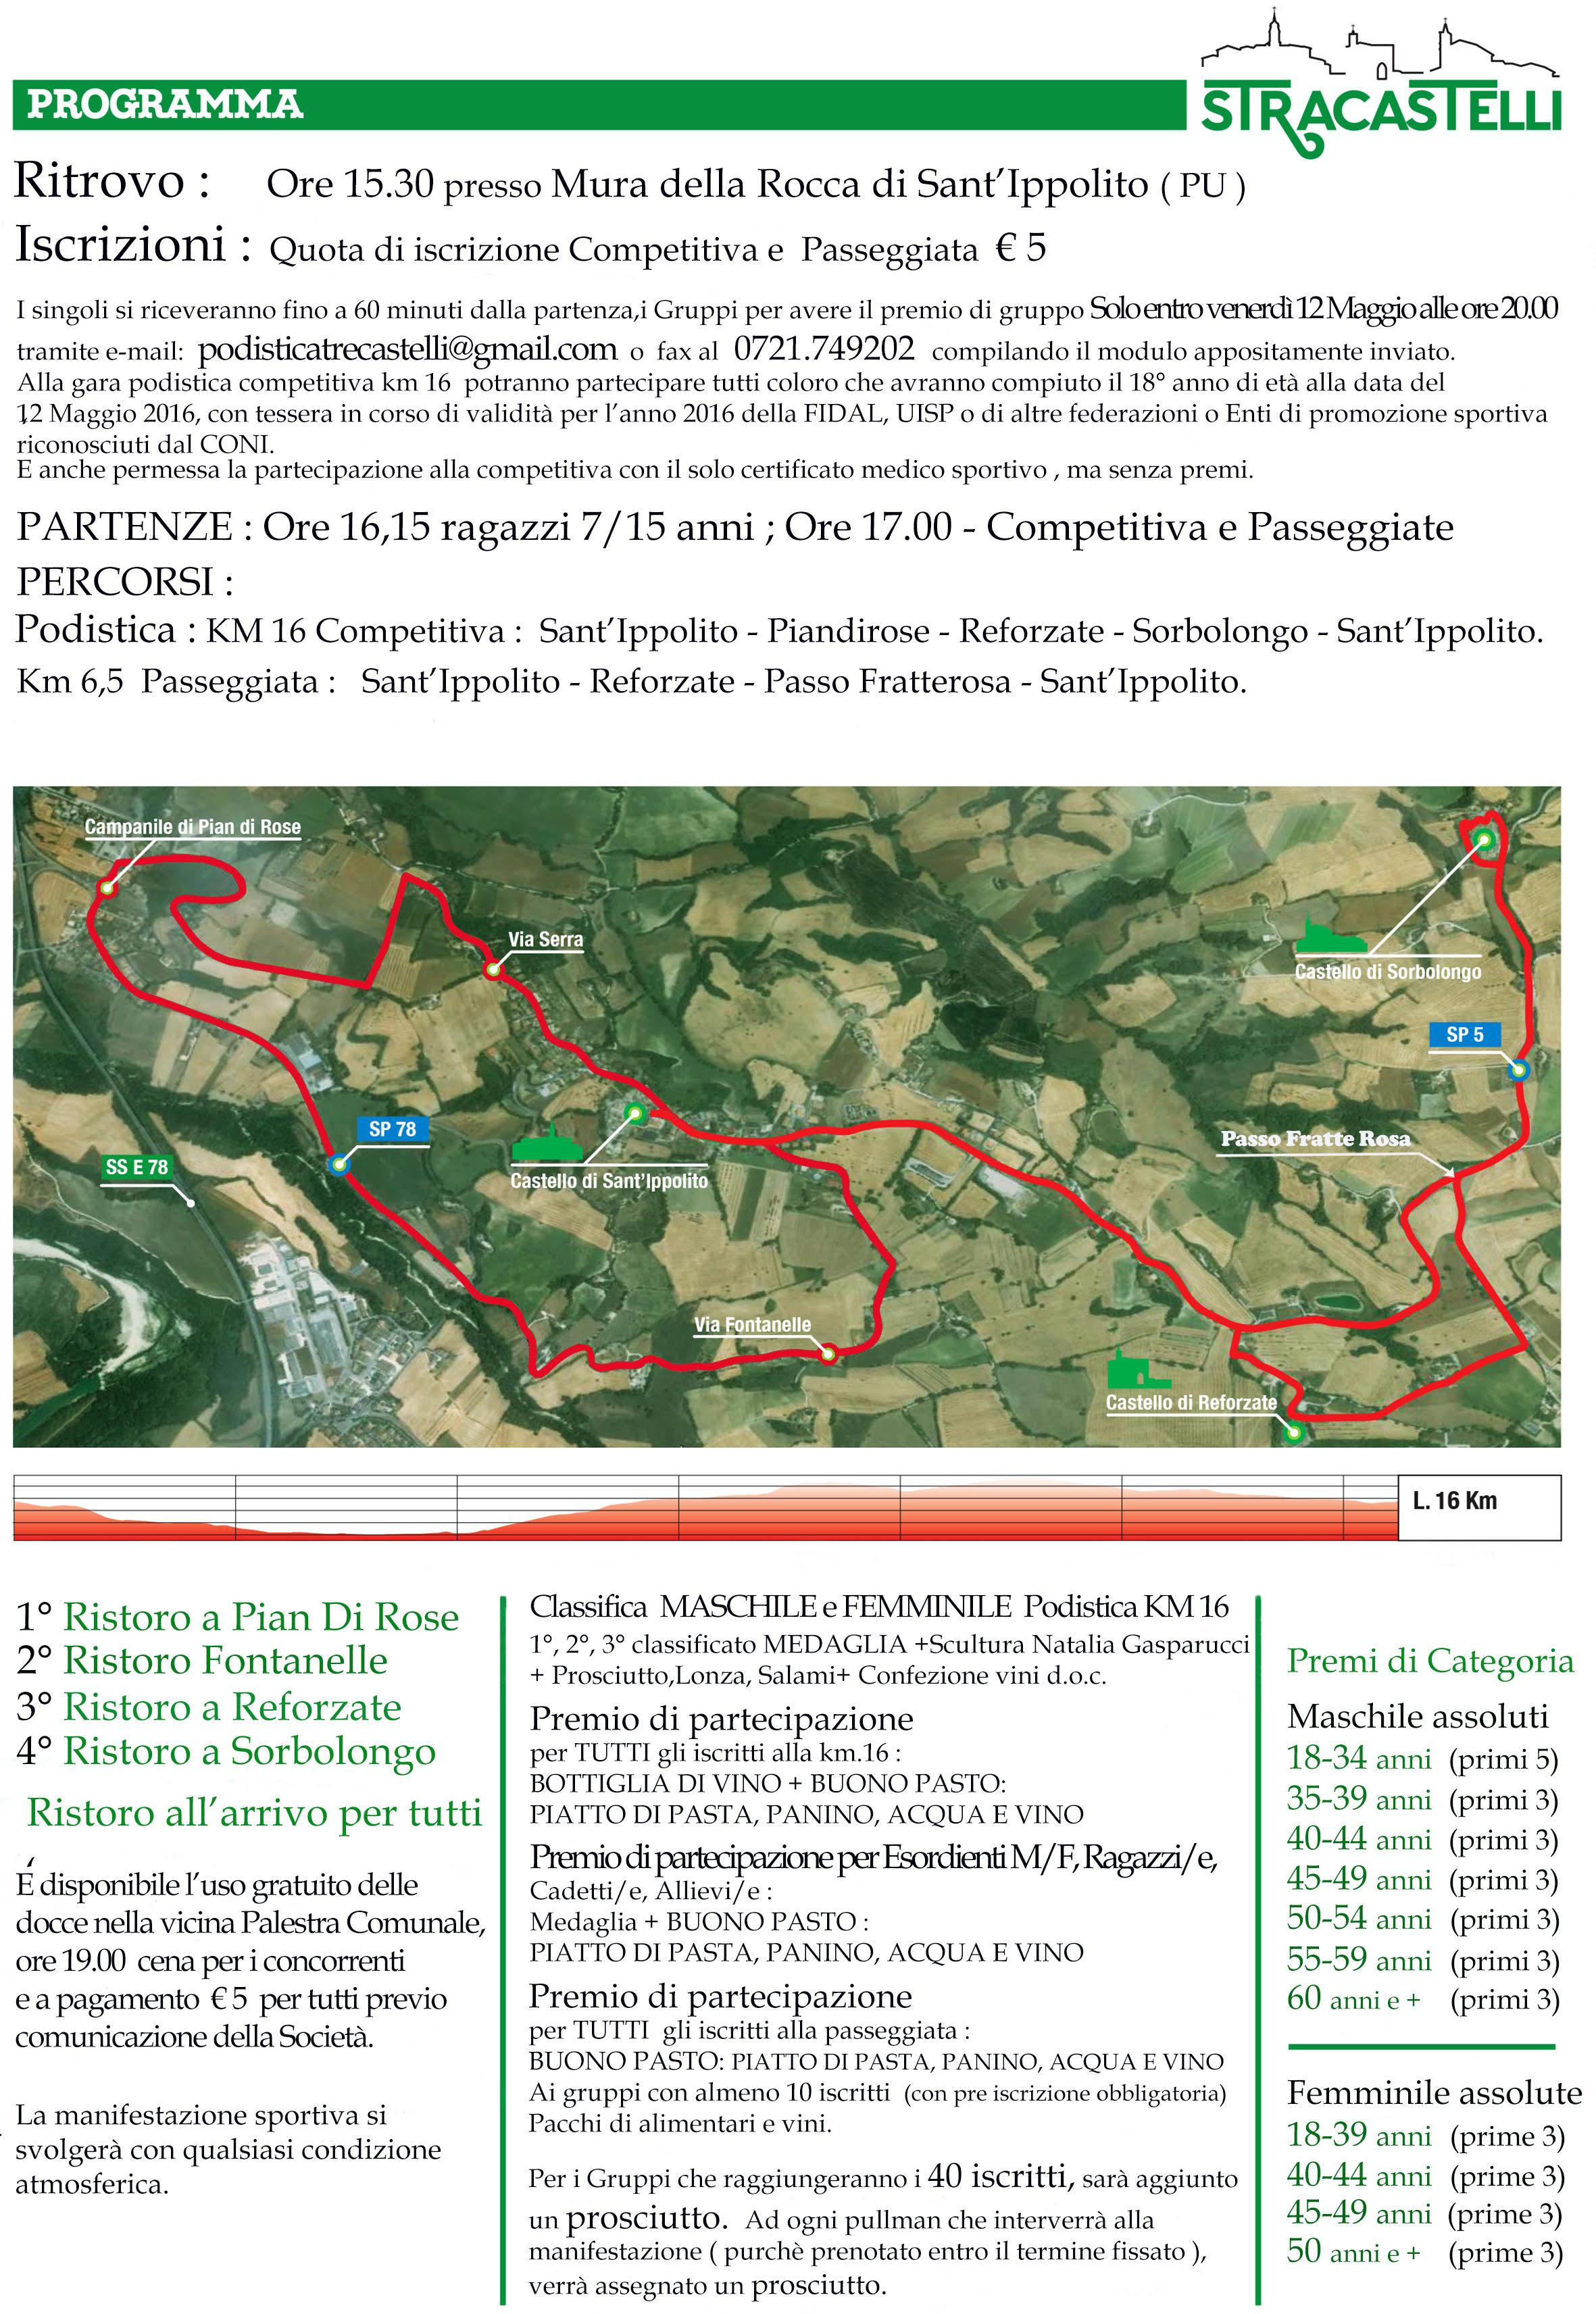 Stracastelli 2017 programma